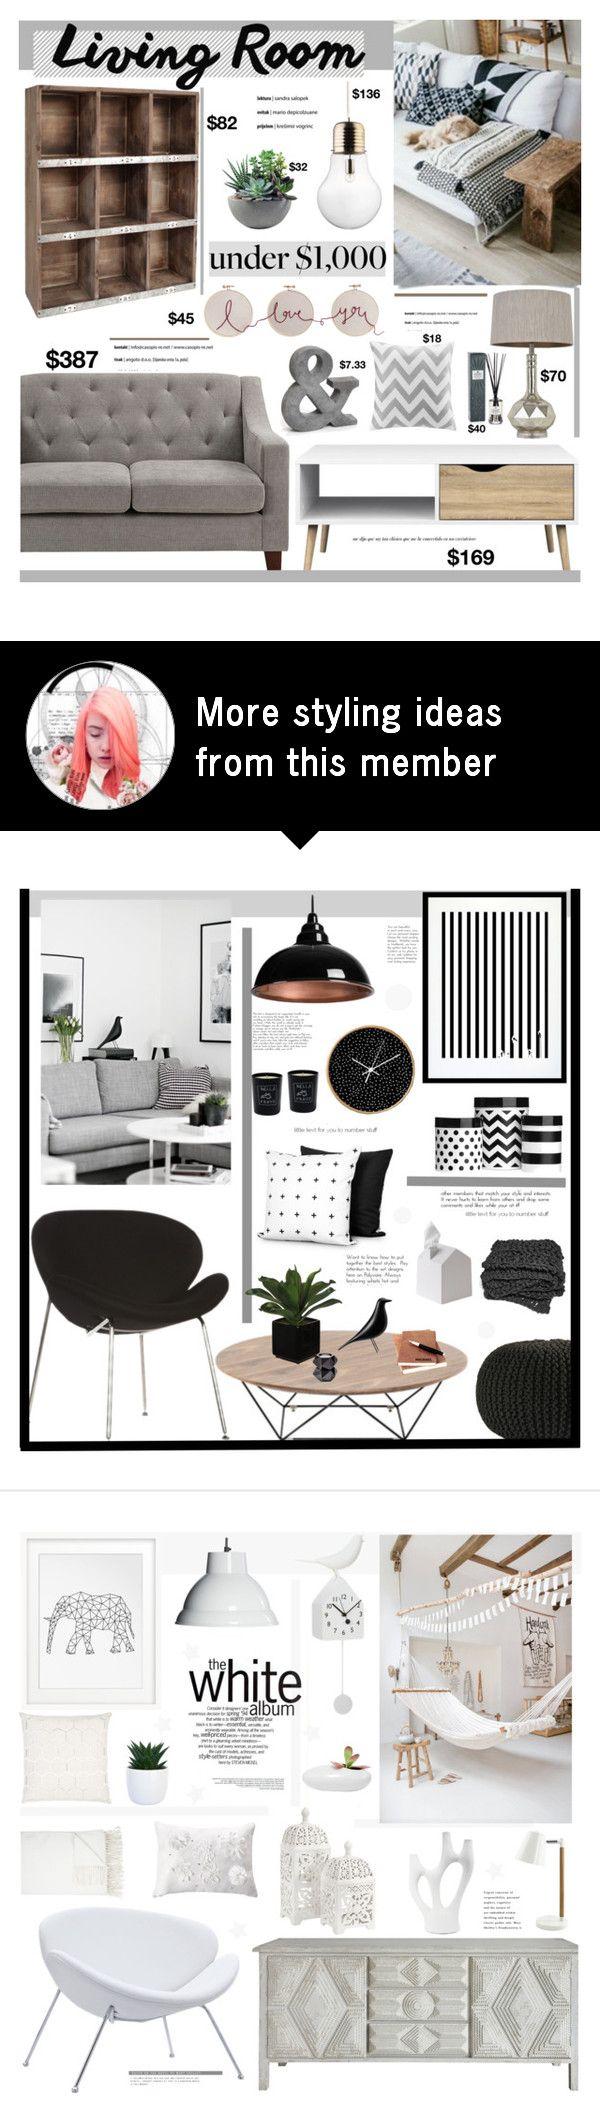 Untitled  2282  by liliblue on Polyvore featuring interior  interiors   interior design. Best 25  Fusion design ideas on Pinterest   Restaurant design  Bar